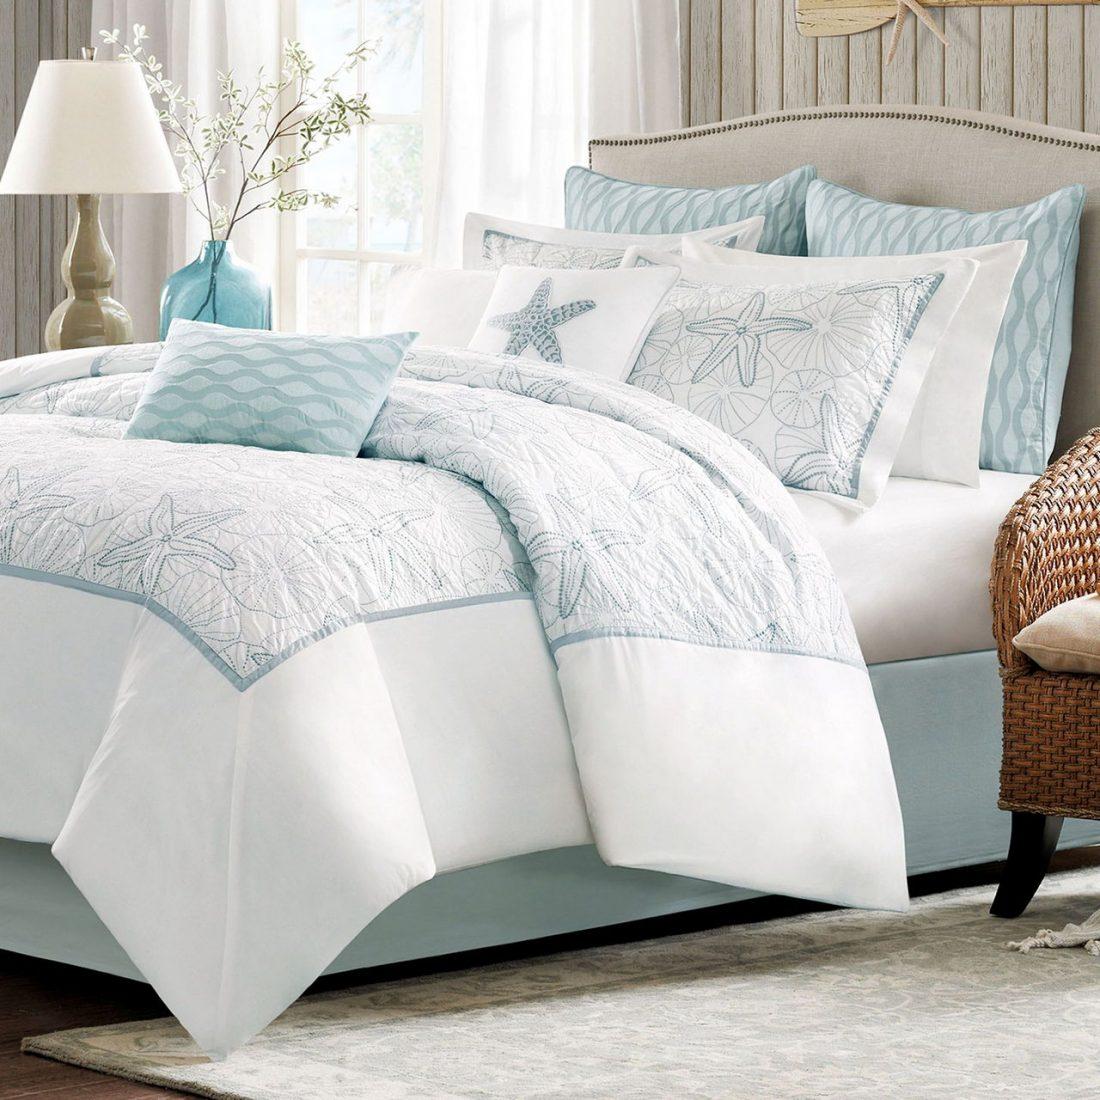 Спальня в стиле прованс 13